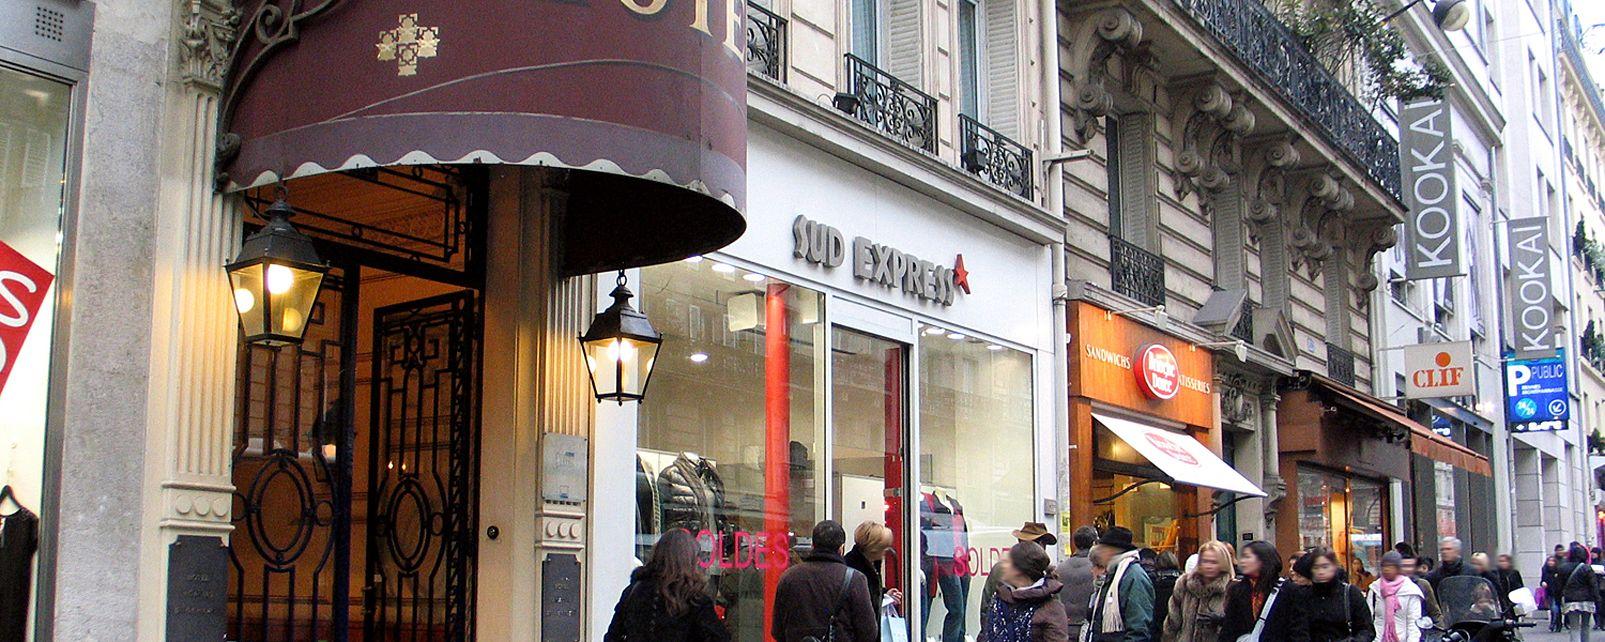 Hotel Acacias St Germain Othon Classic